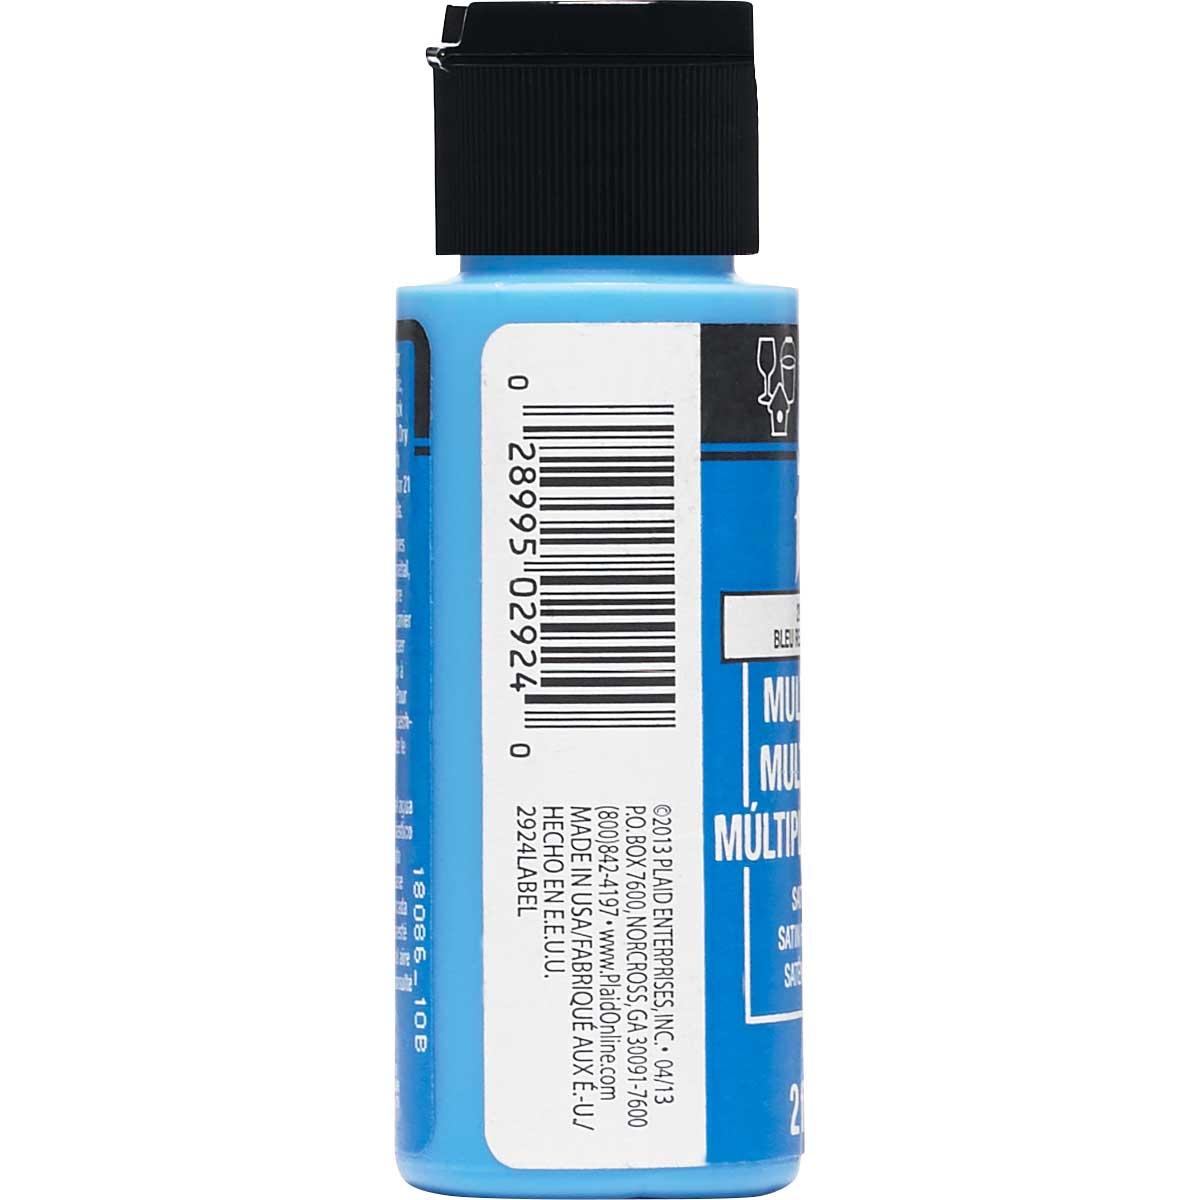 FolkArt ® Multi-Surface Satin Acrylic Paints - Look at Me Blue, 2 oz.